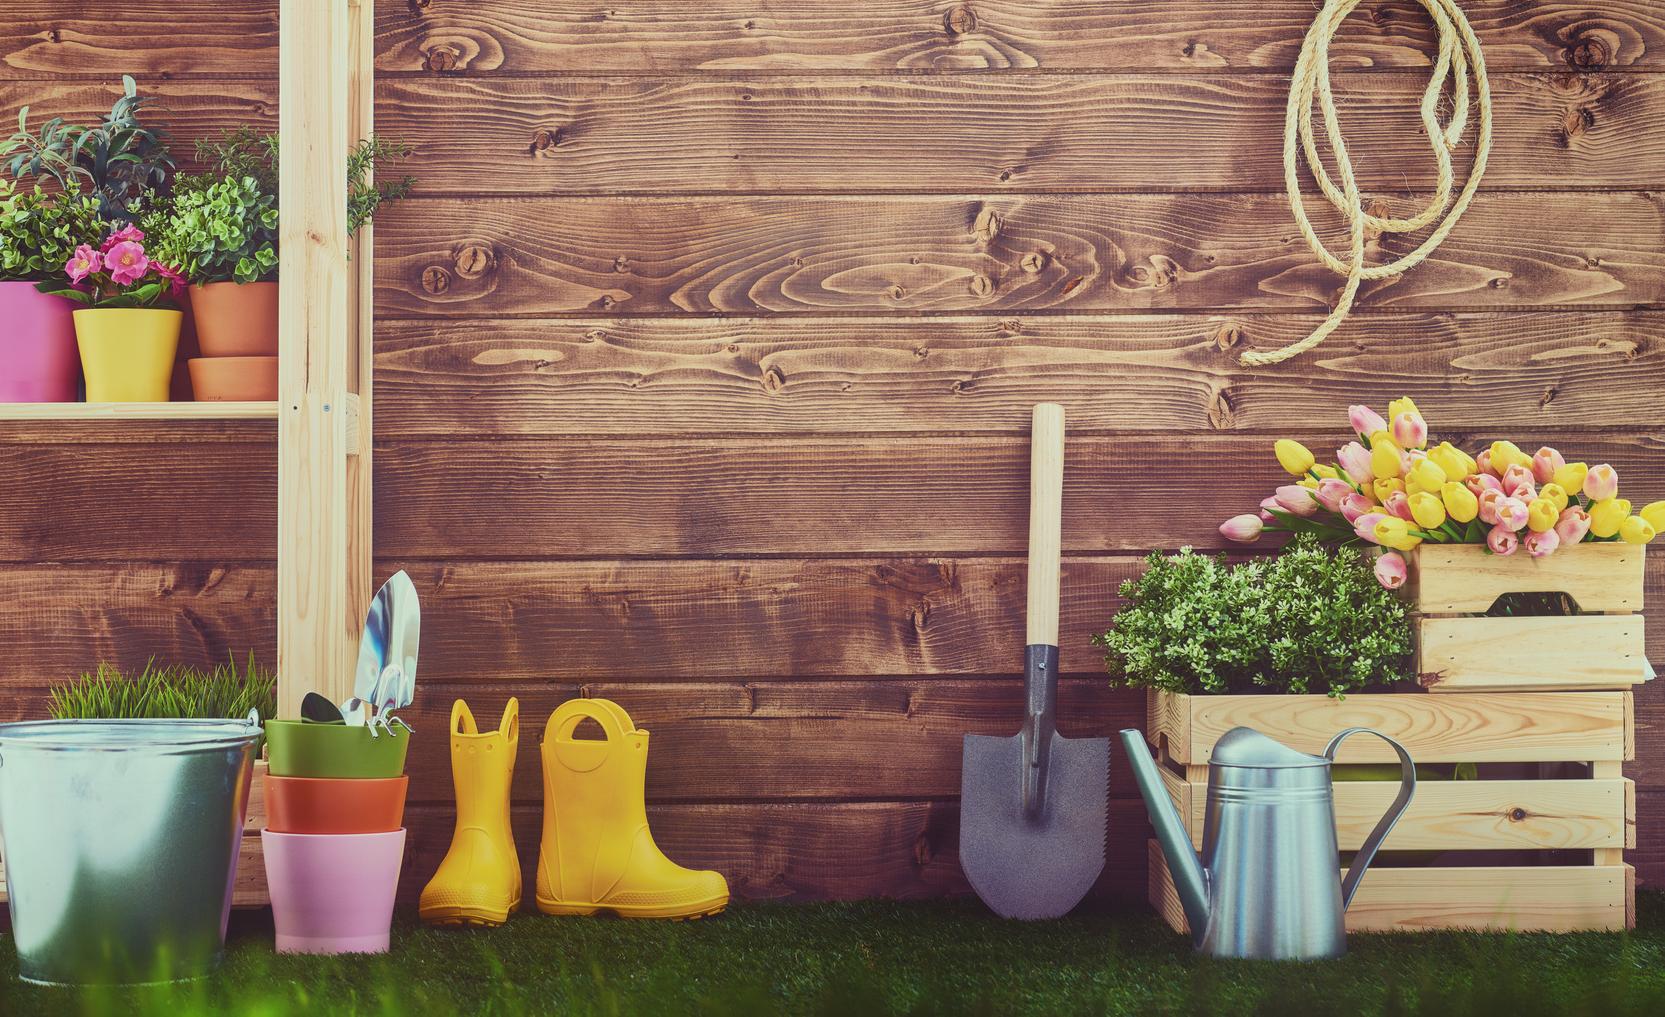 spring-preparations-for-landlords-rental-property